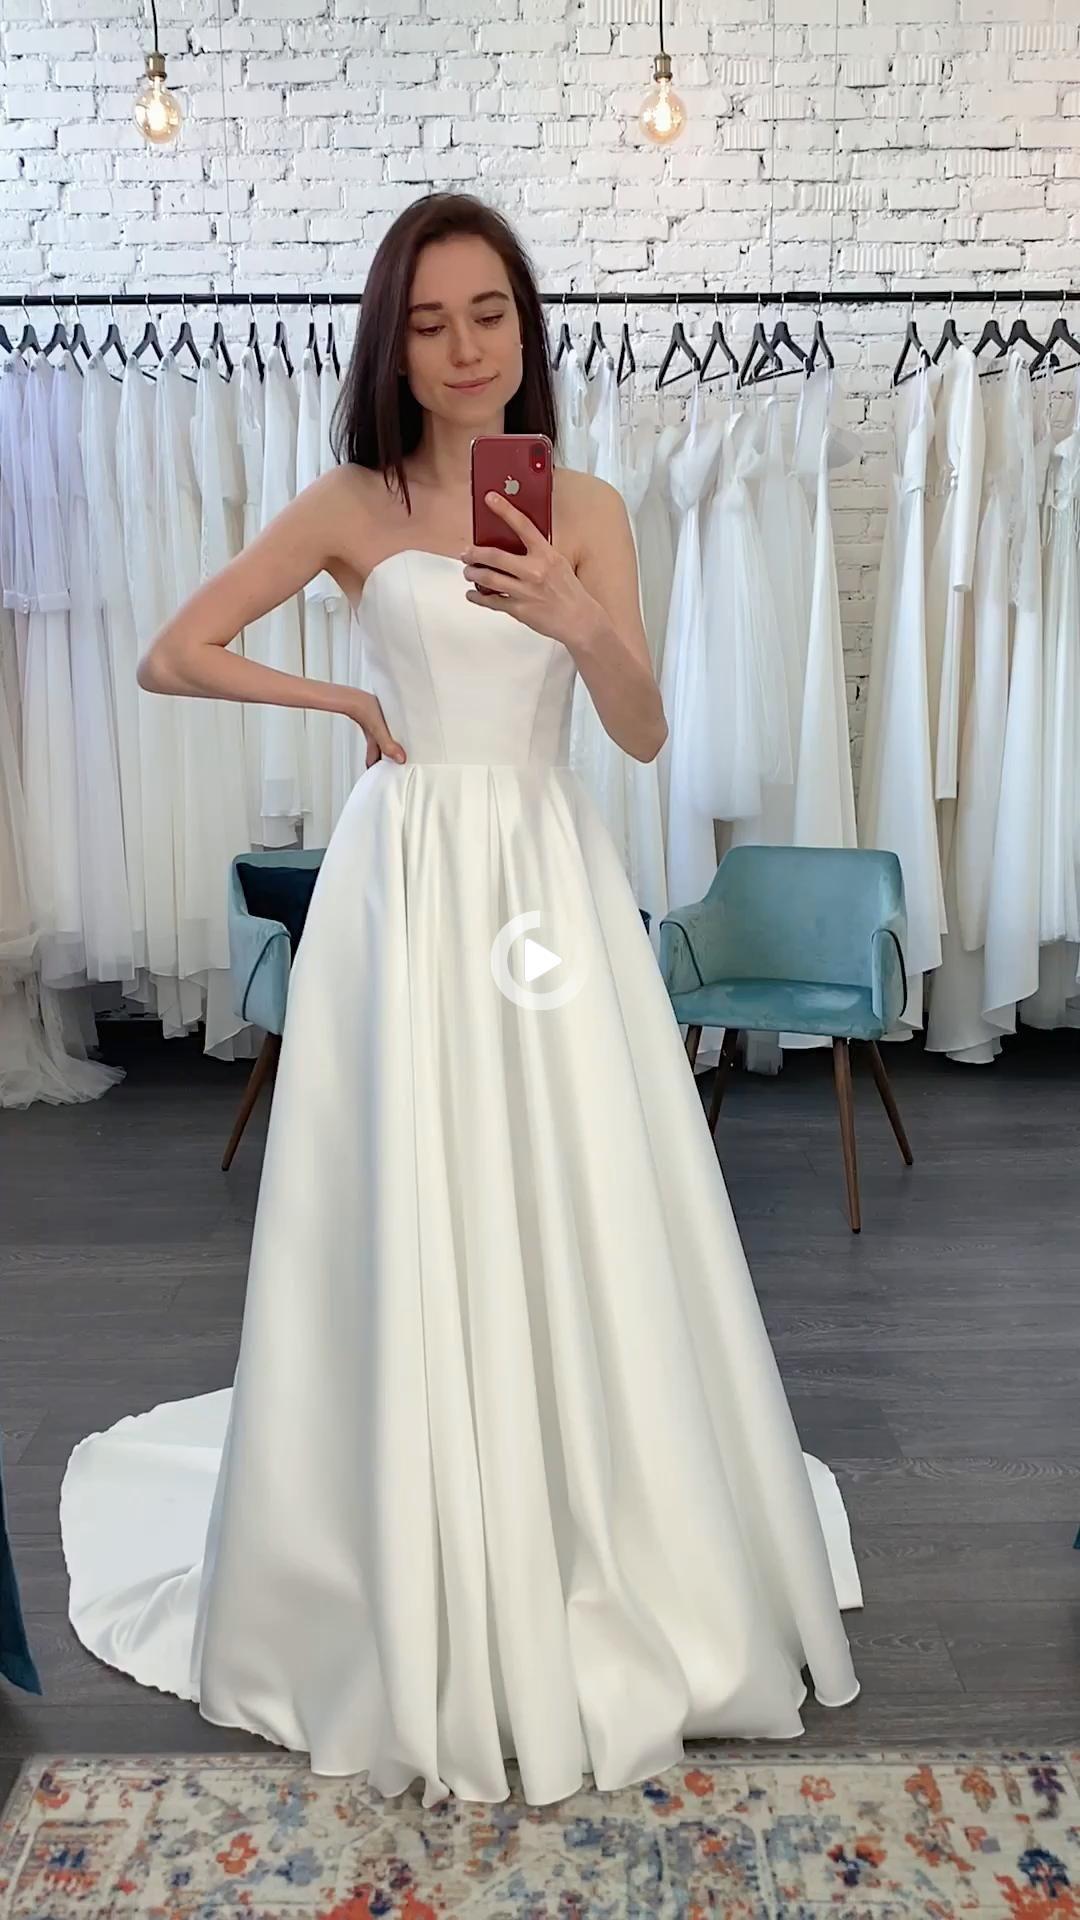 Neon Light Blue Minx Nails Minx Nail Art Zazzle Com In 2021 Petite Wedding Dress Simple Wedding Dress Strapless Plain Wedding Dress [ 1920 x 1080 Pixel ]